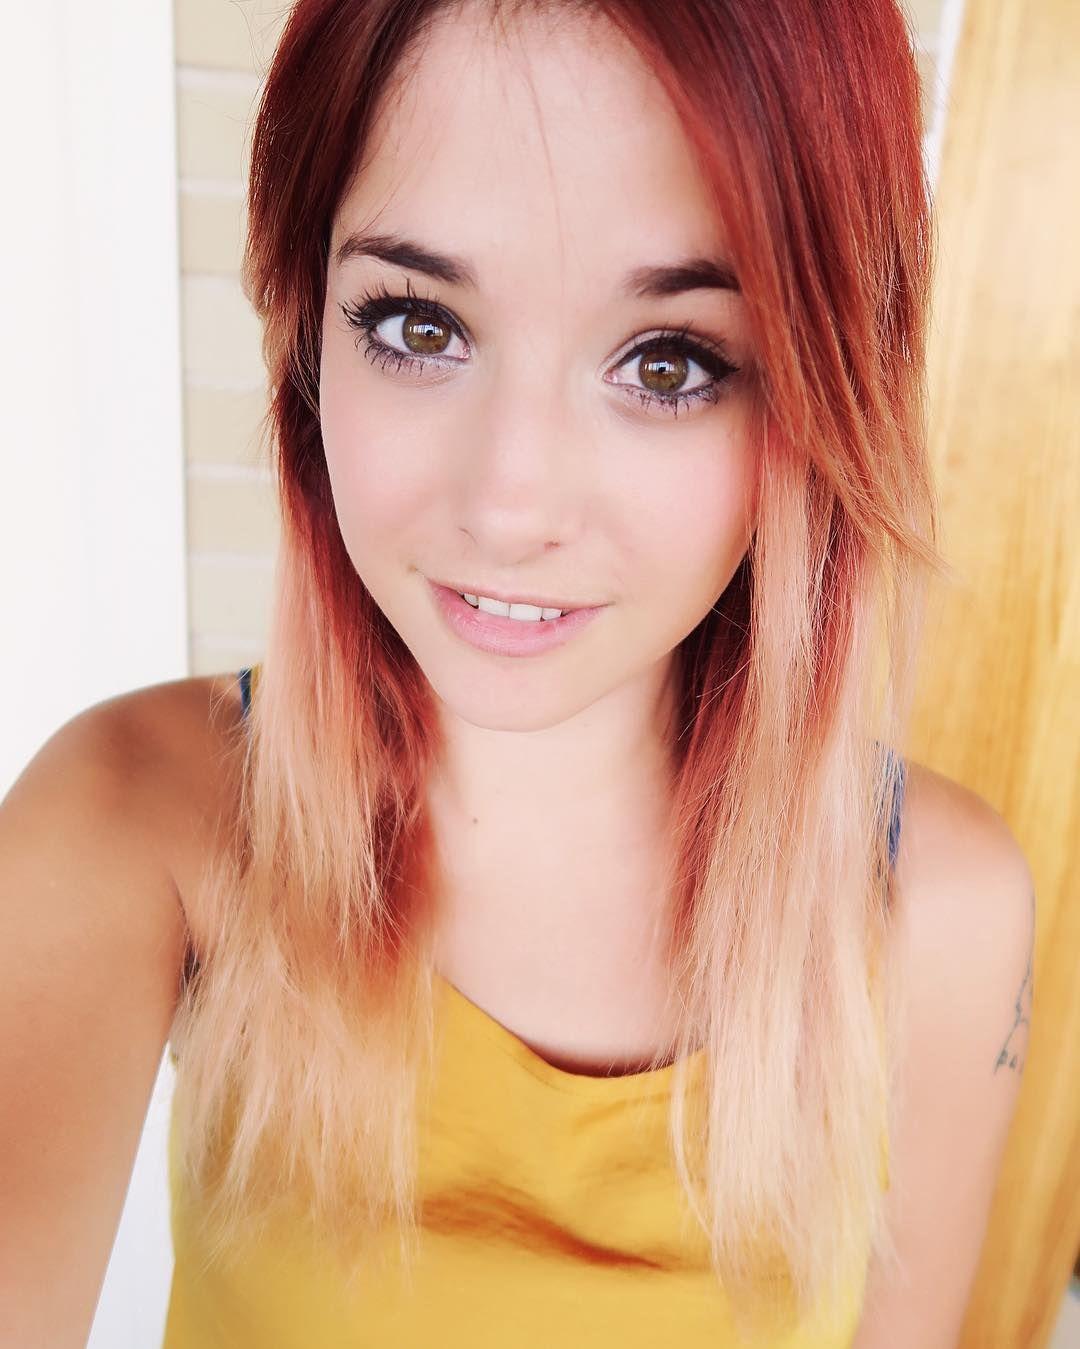 Ethieen | Amazing girls | Pinterest